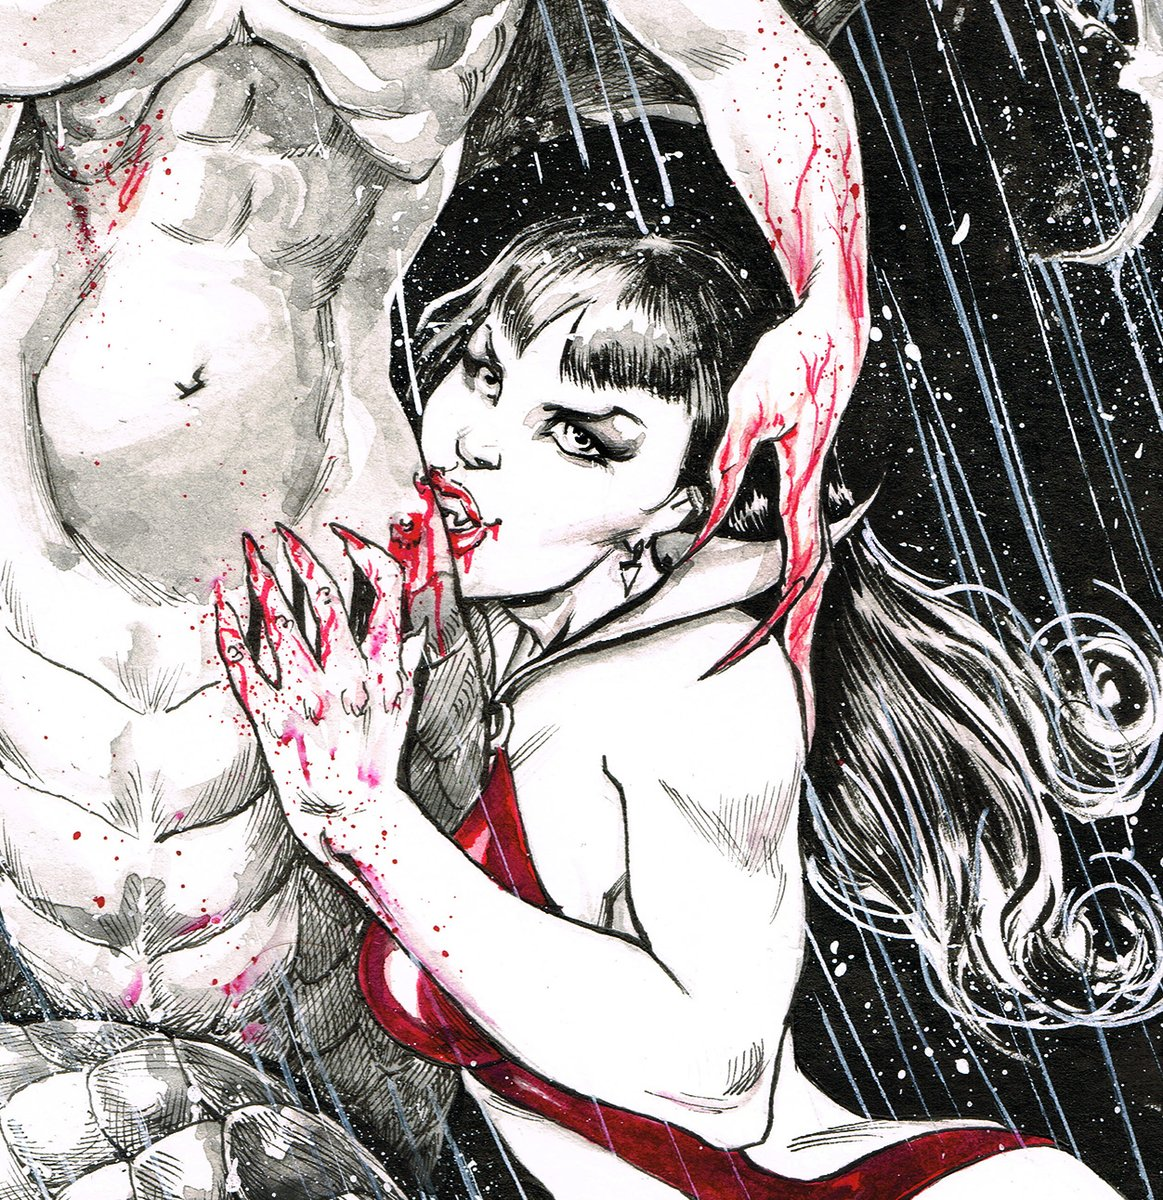 Vampirella, watercolor. #vampirella #watercolorart #vampirellacomics #comics #illustration #eroticart #doodle #sketch #sketches #art #artontwitter #ArtOfTheDay